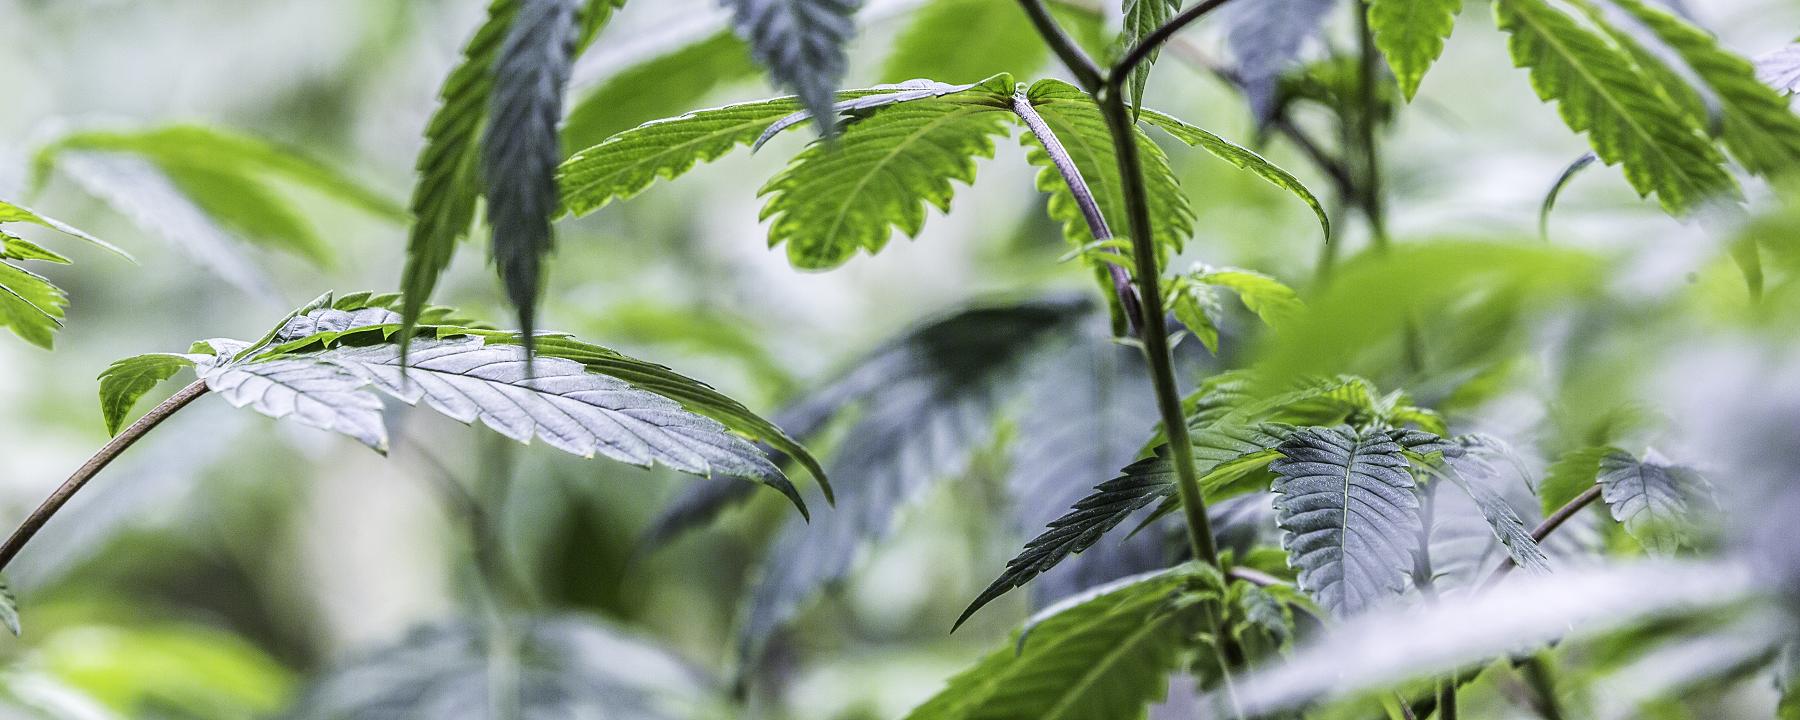 UK to Legalize Medicinal Cannabis